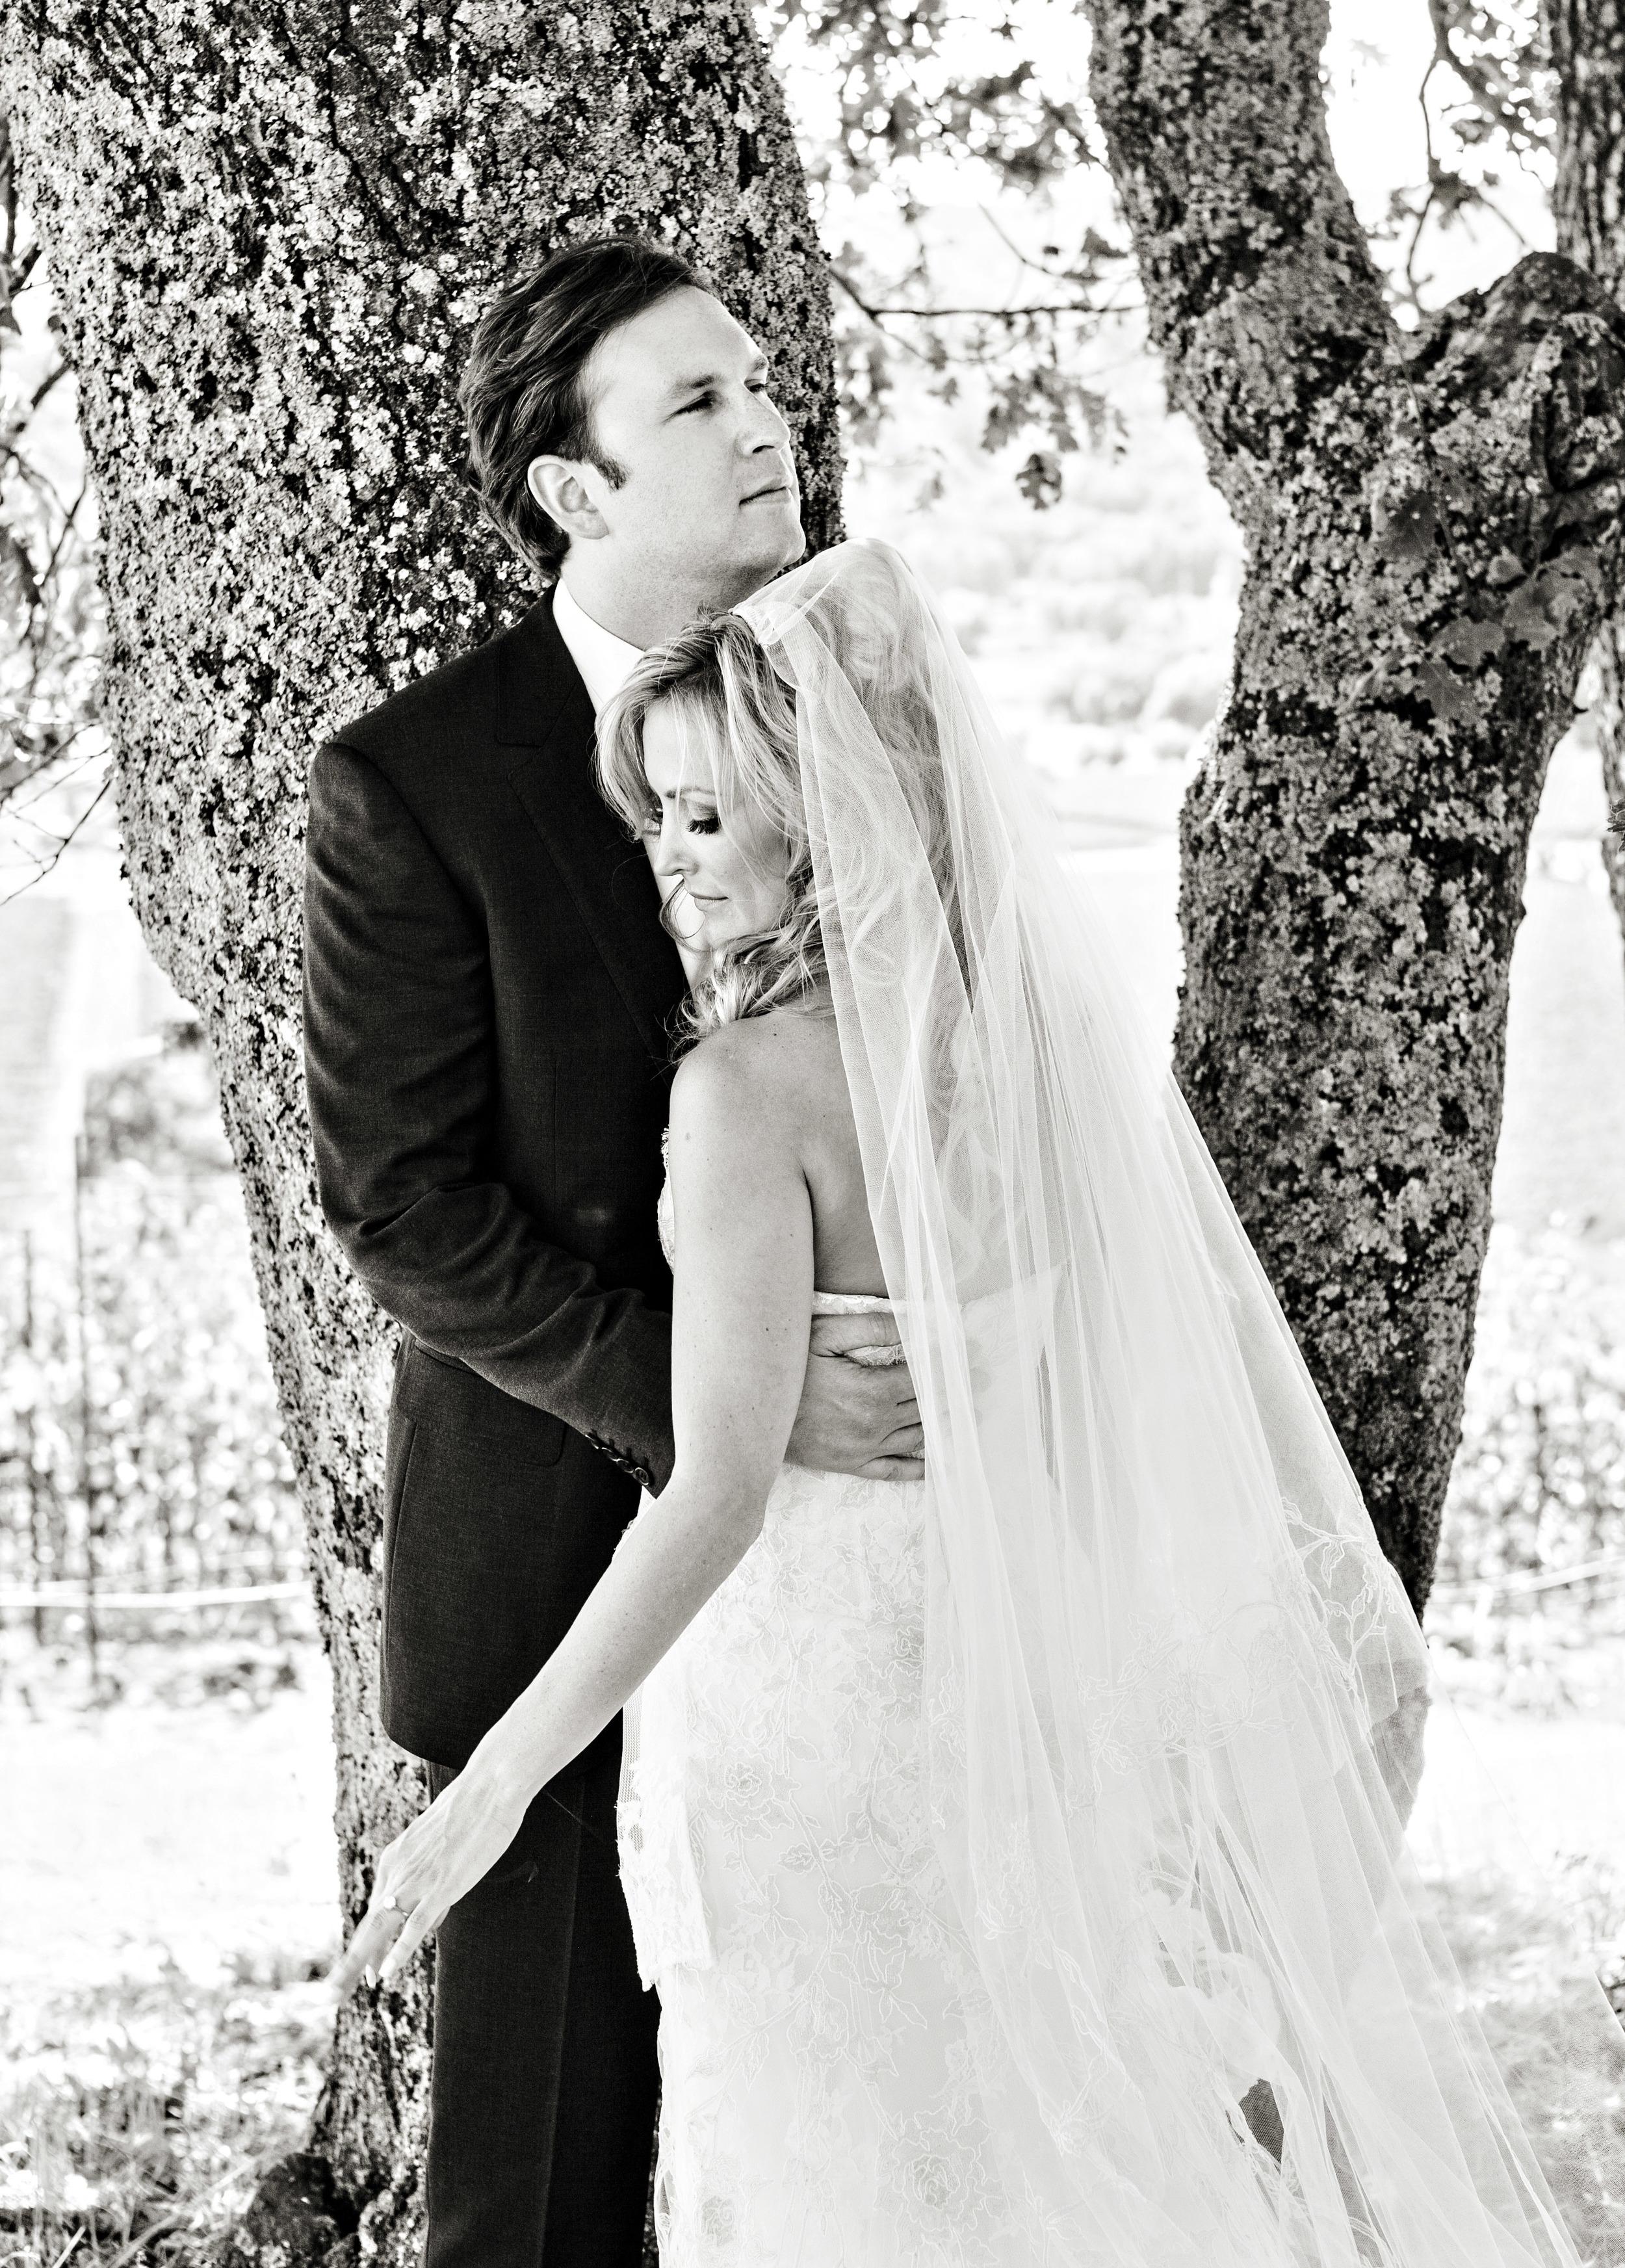 12. RS - napa wedding, vineyard ceremony, artsy bride & groom shot.jpg